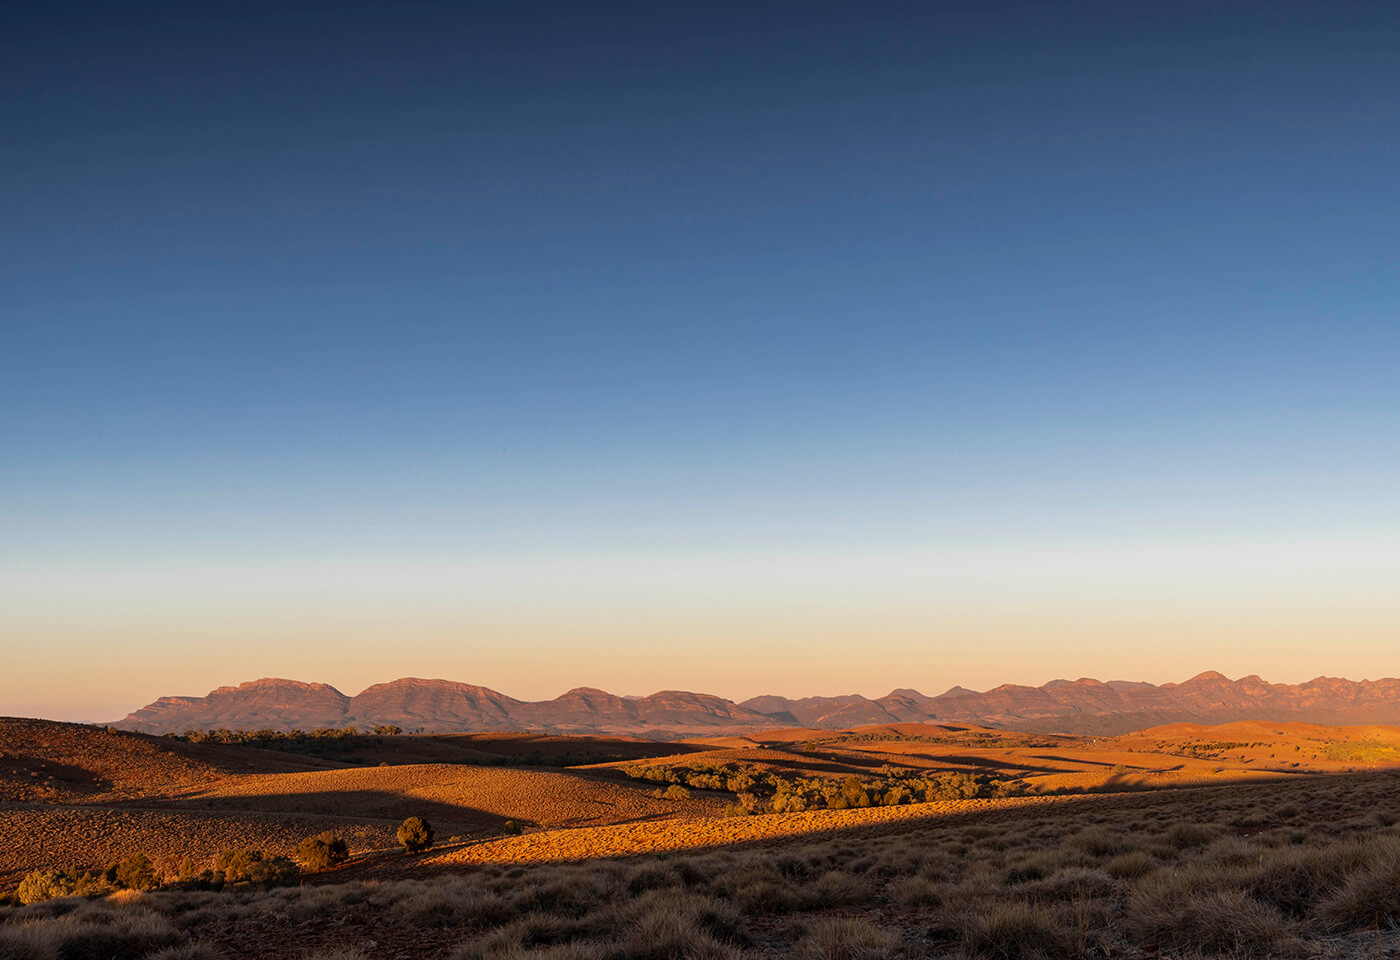 Landscape image of sunset